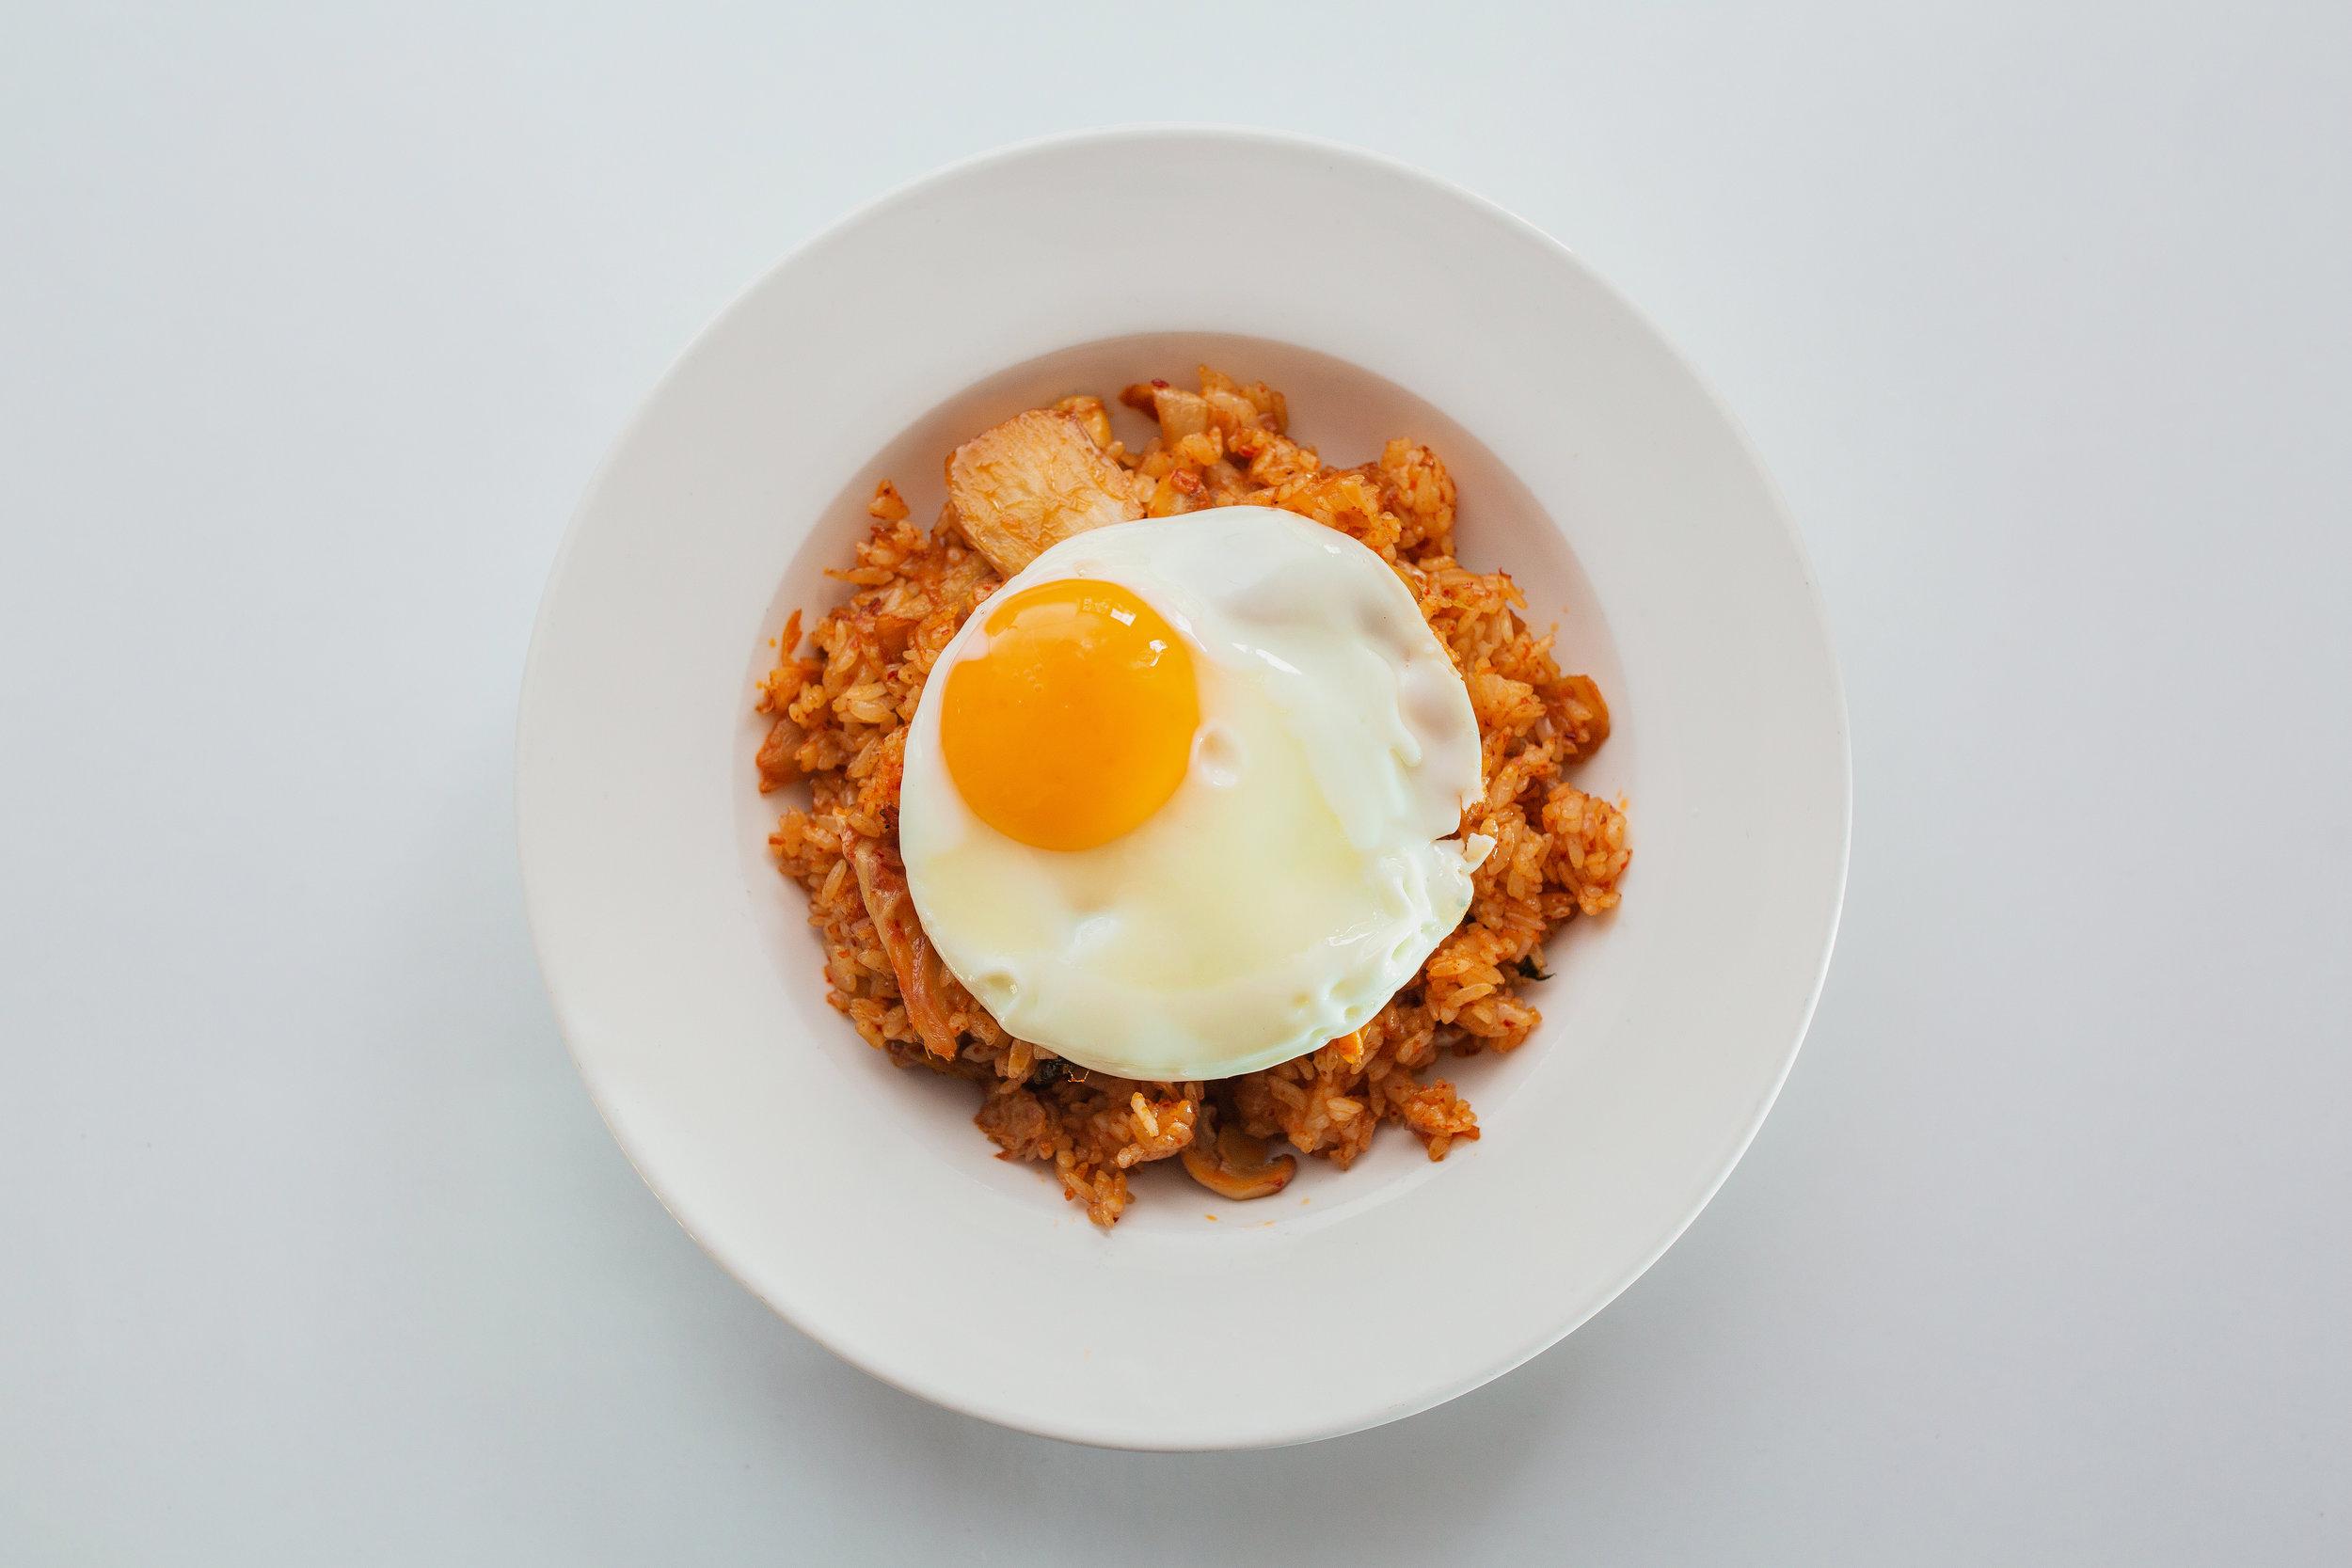 Kimchi plov - Kimchi, mushroom, onion, rice, oyster sauce and egg290kgs